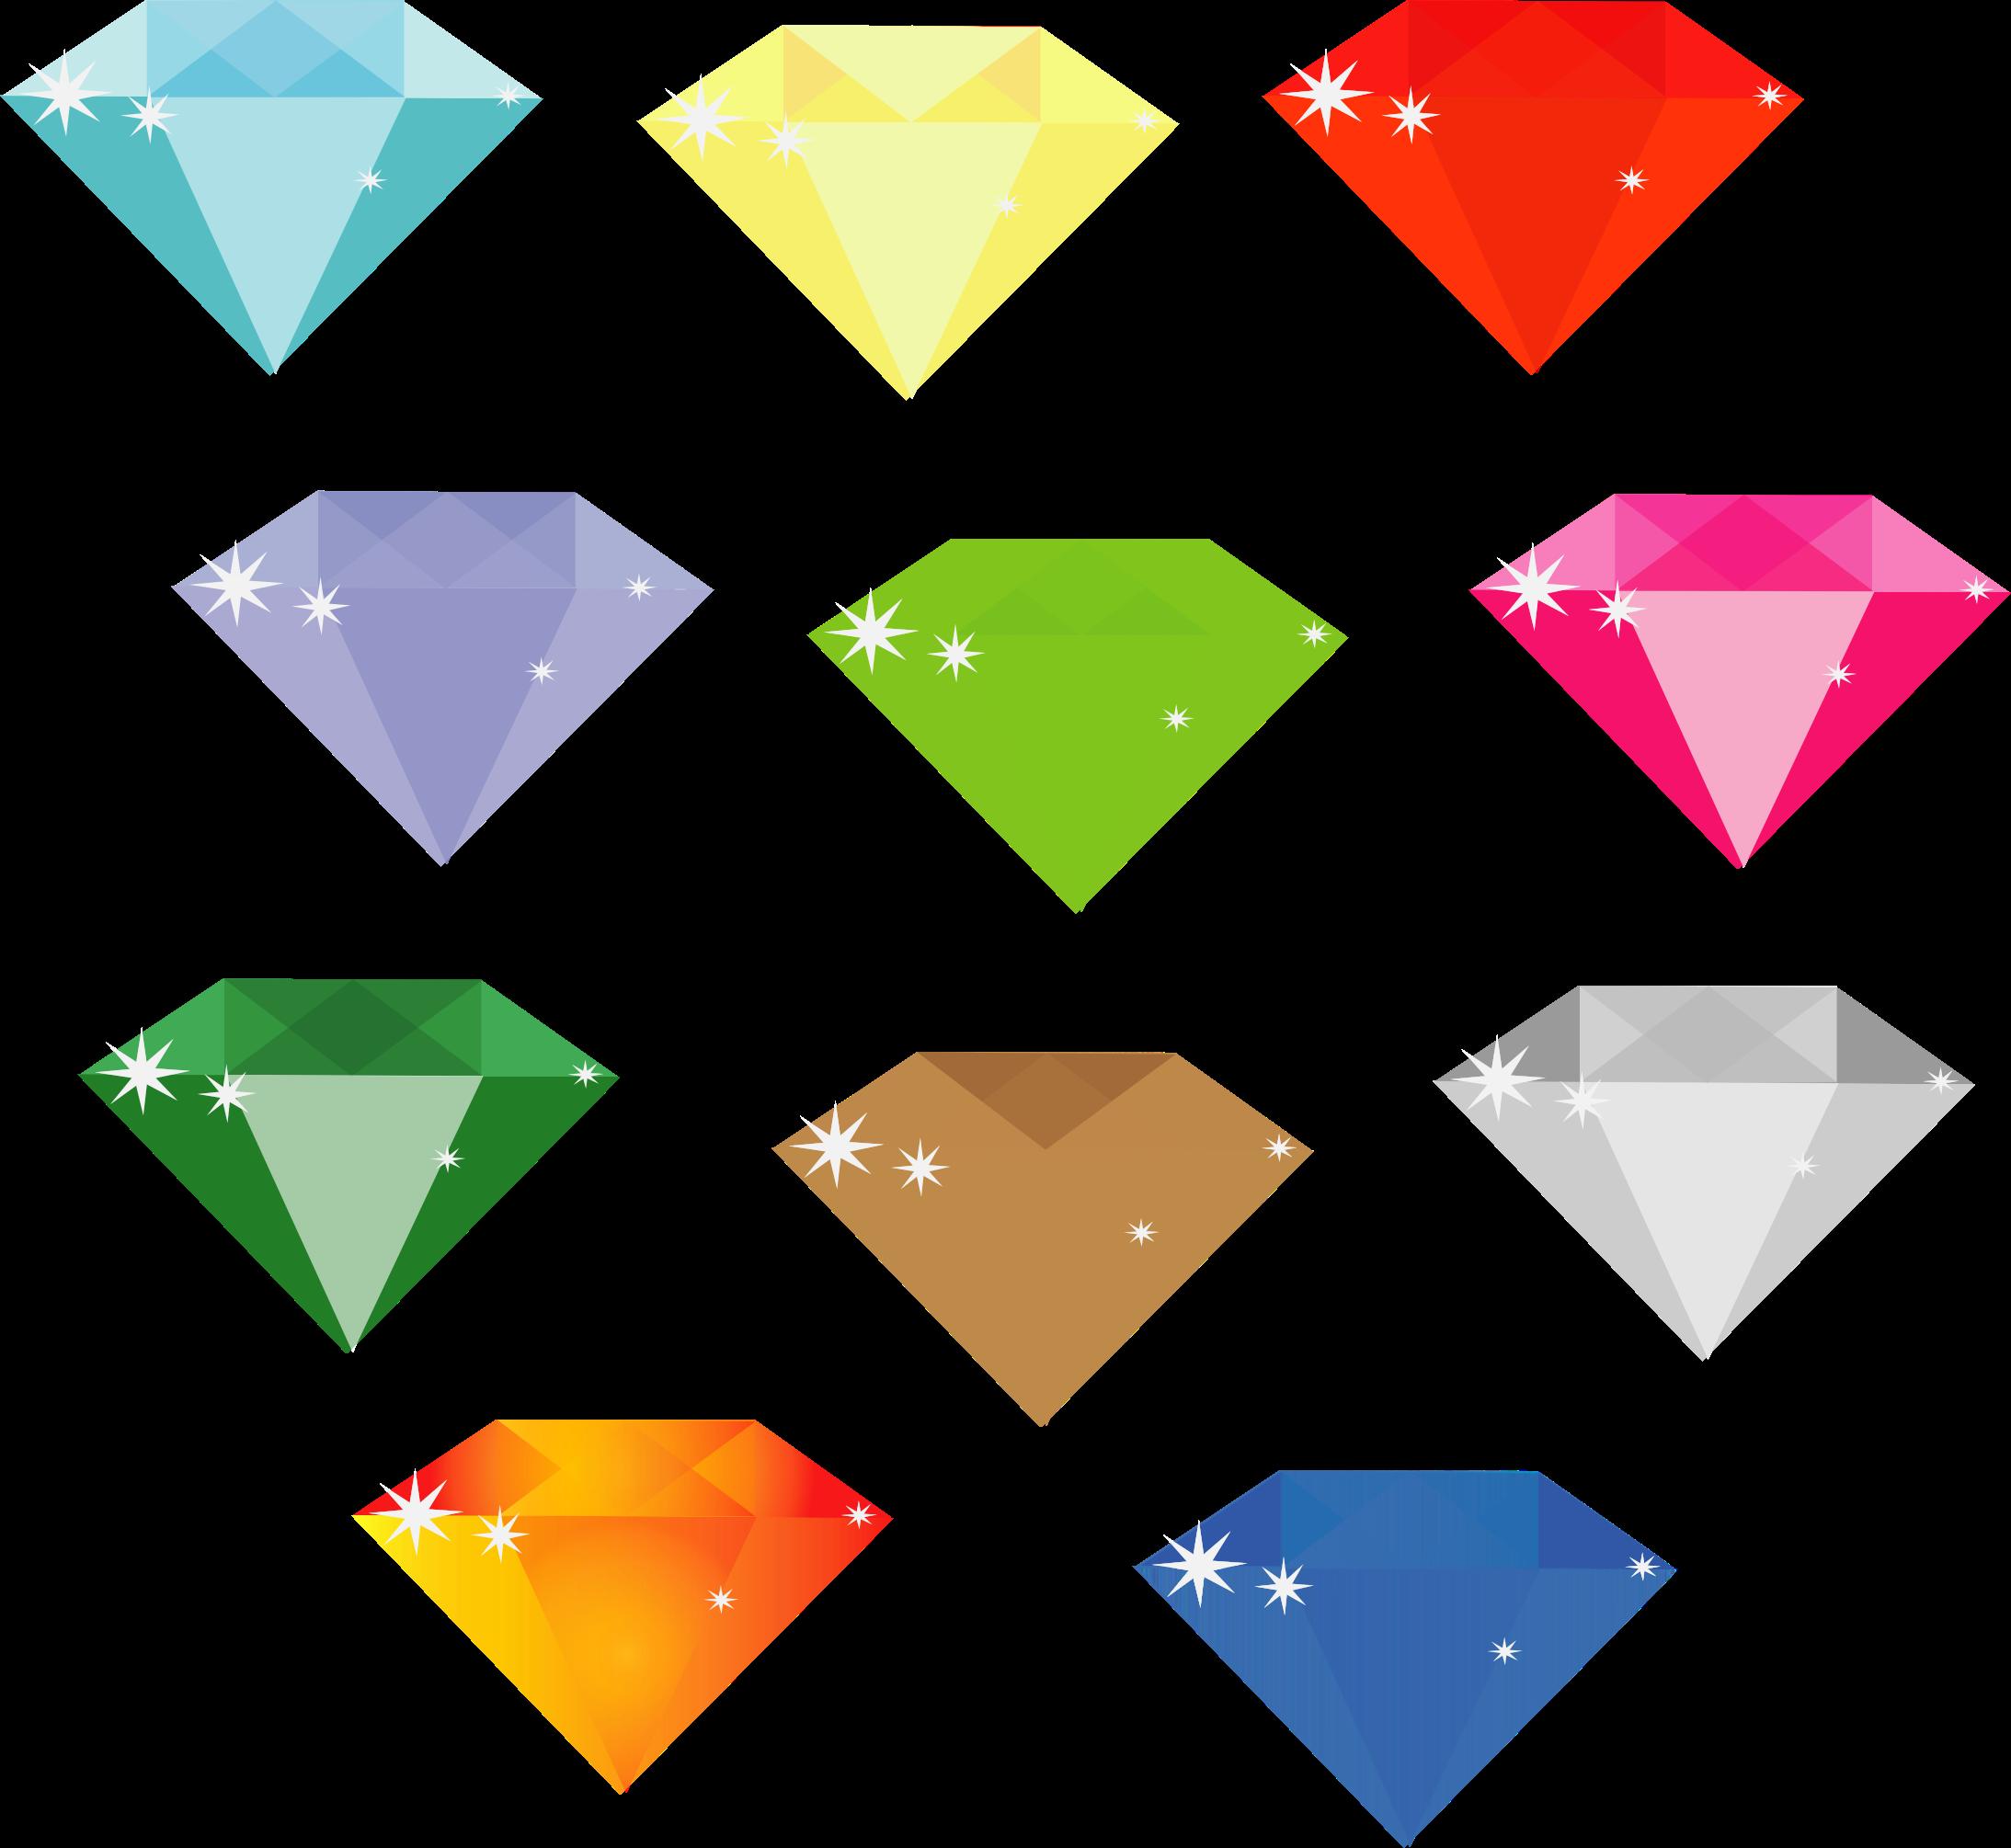 Diamonds clipart simple. Big image png